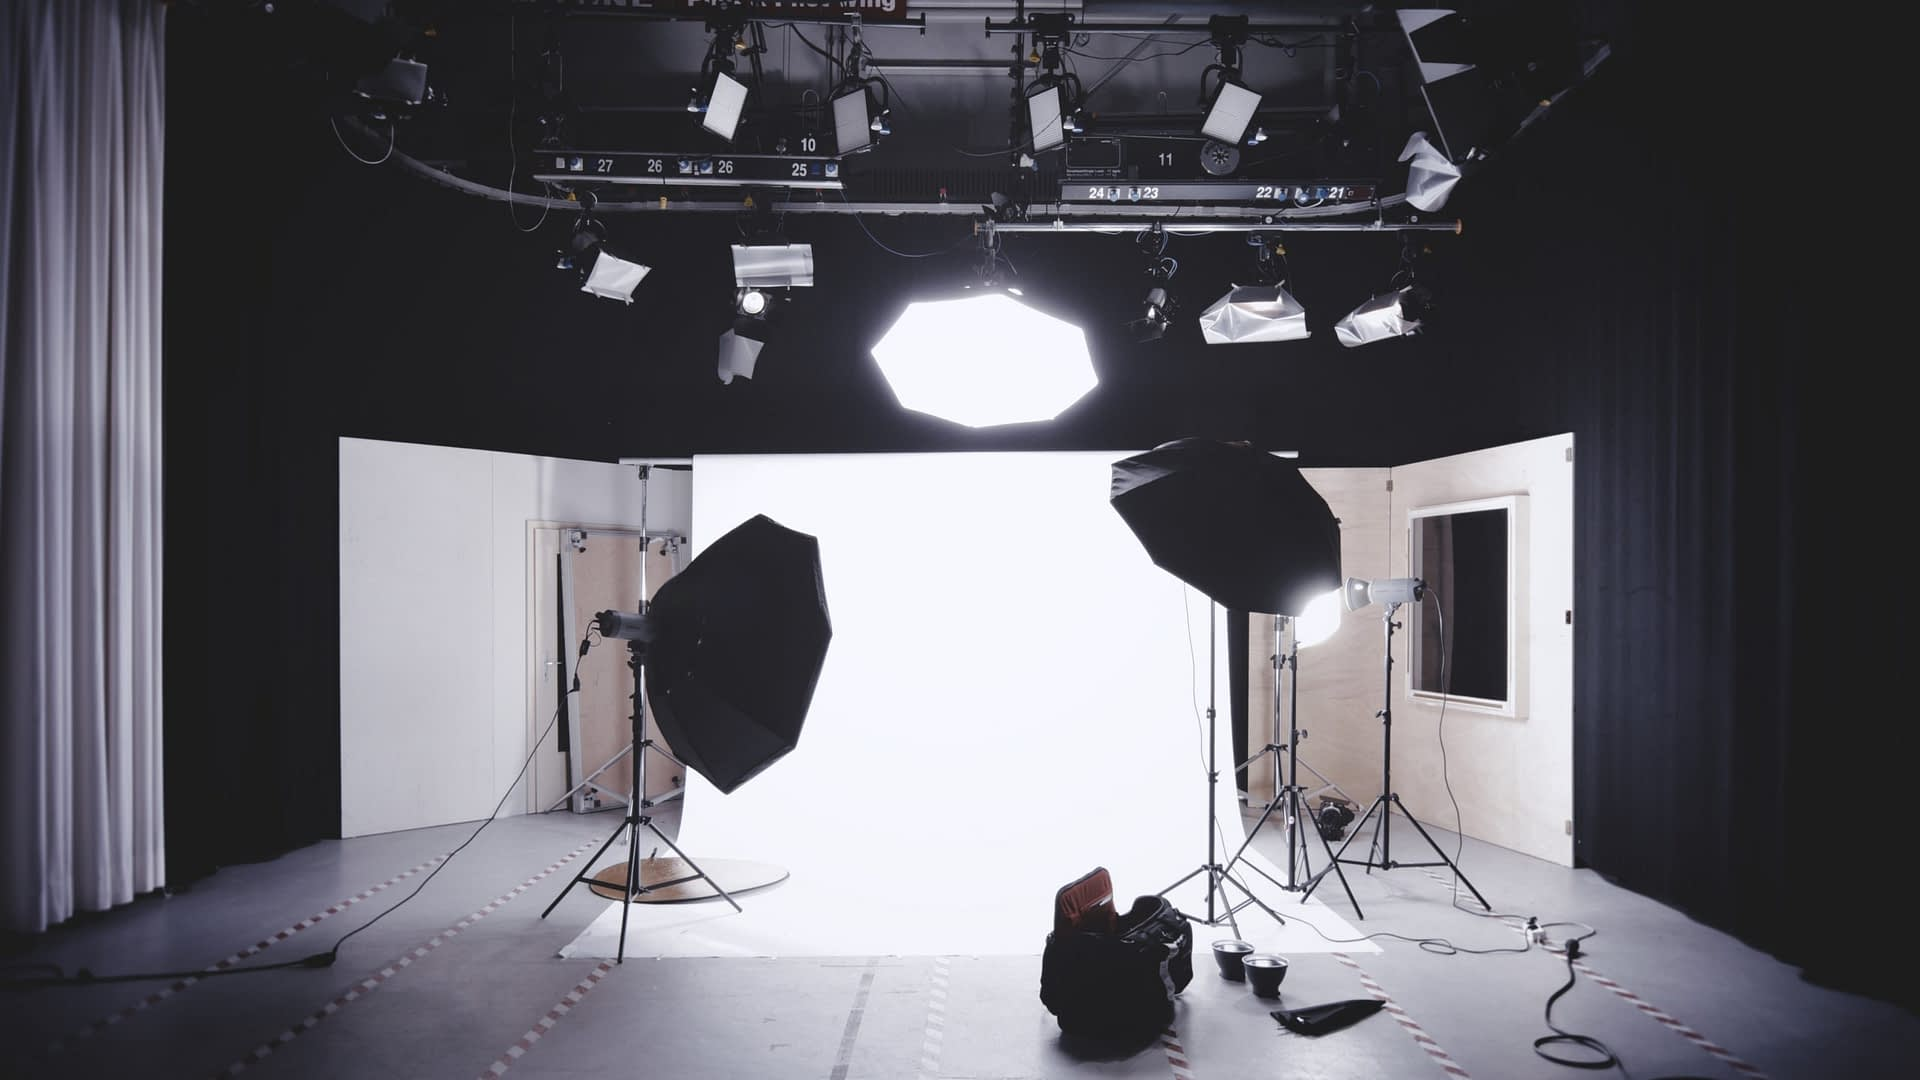 5 Ways to Combat Returns with Product Photos